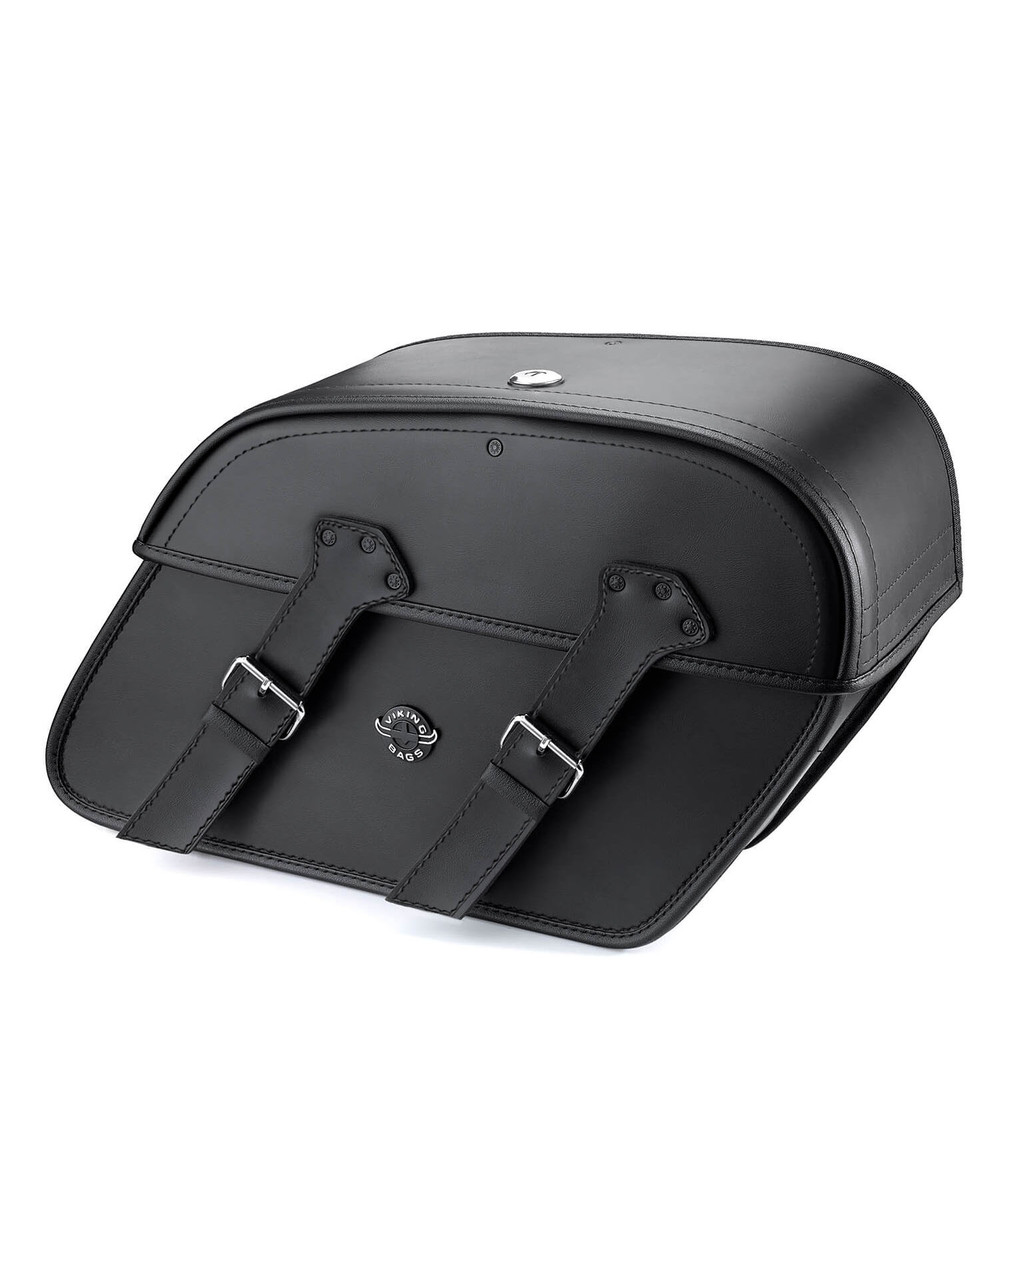 YamaSaddlebags Main Bag Viewha Startoliner XV 1900 Viking Raven Medium Leather Motorcycle  Main View